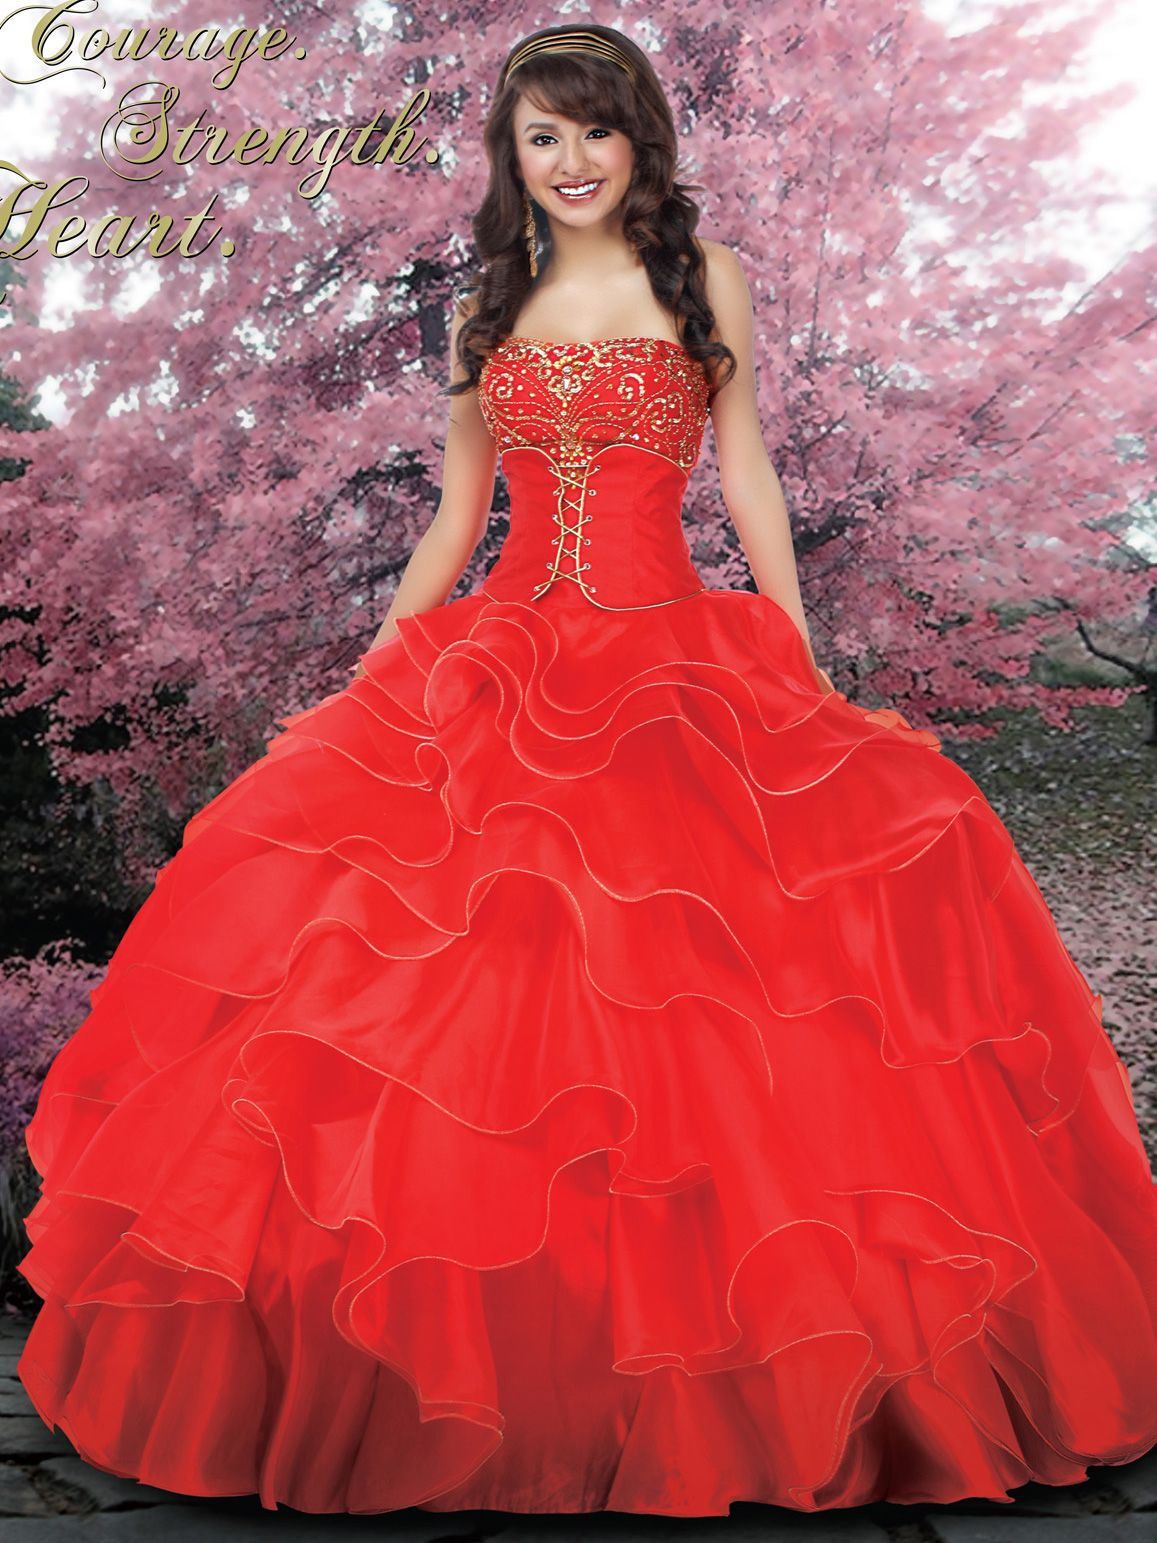 Red quince dress Fancy Dresses Pinterest Quinceanera Quince